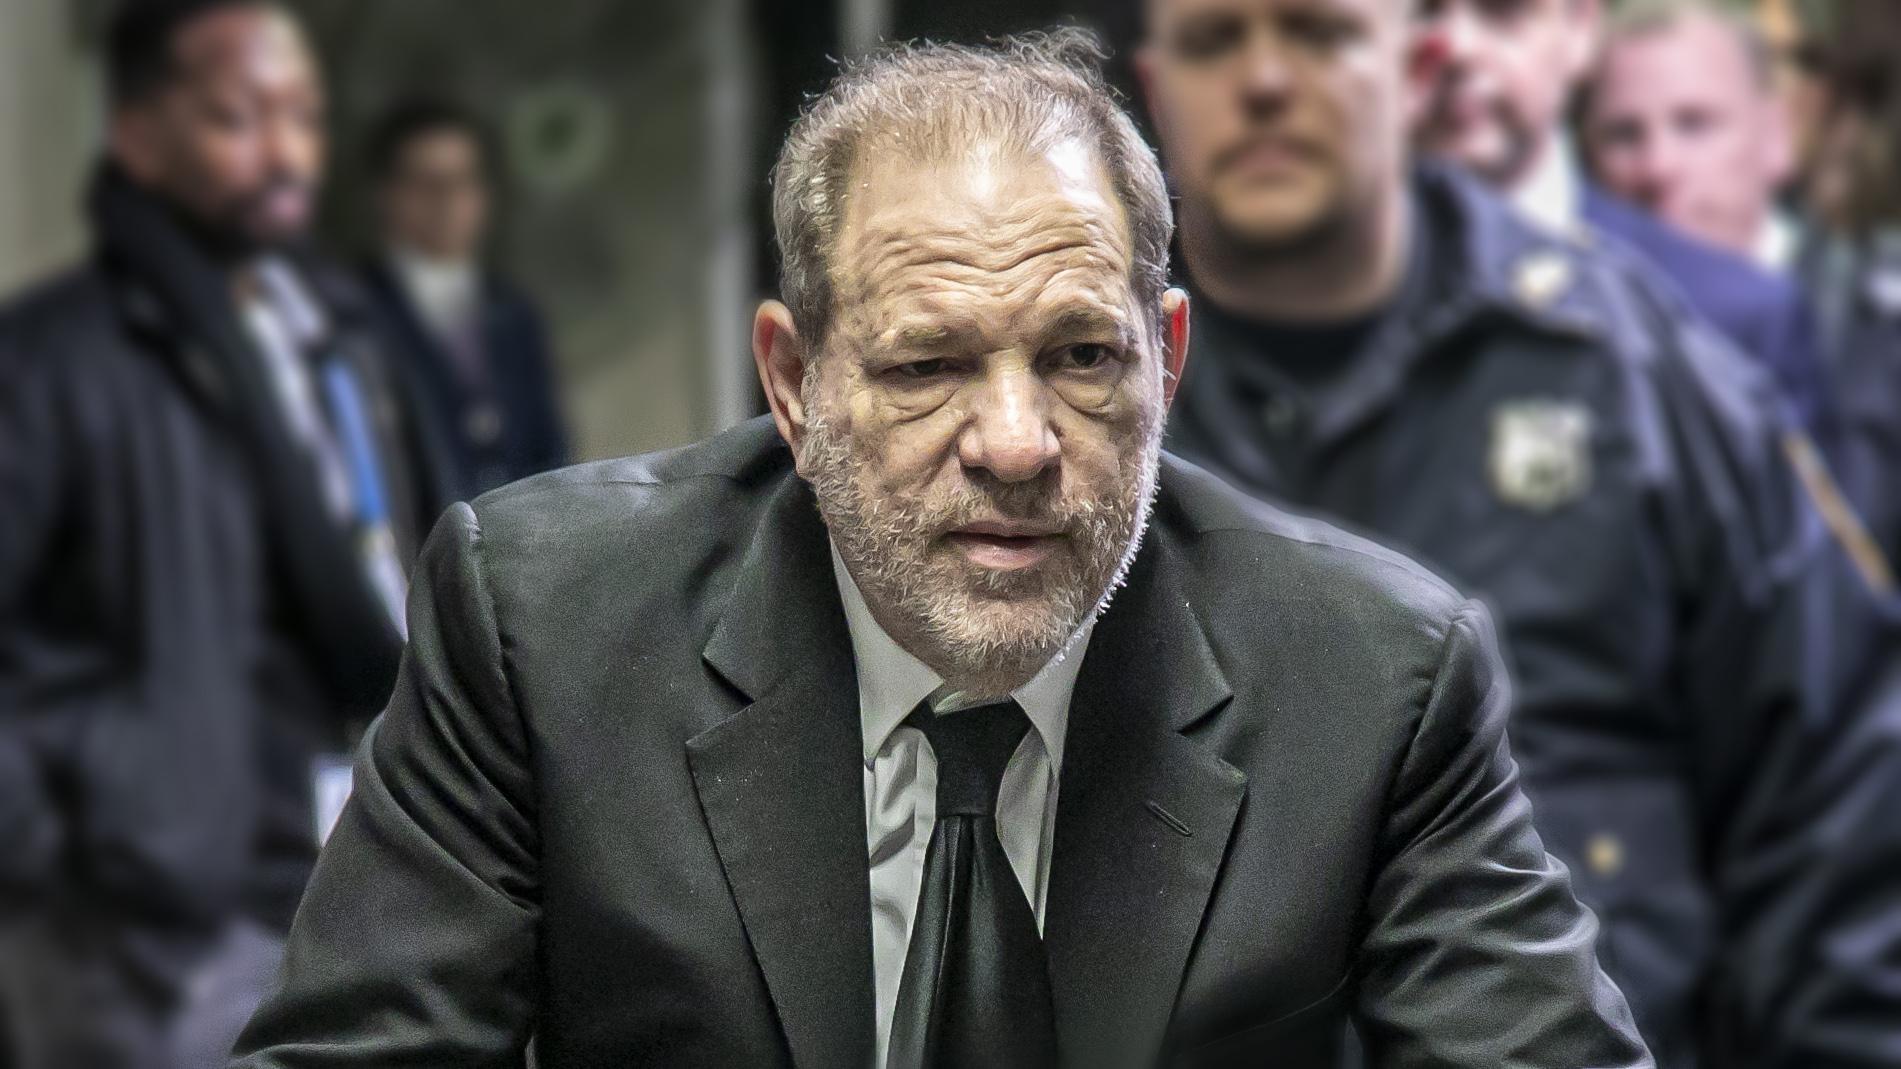 Robusta evidencia contra Harvey Weinstein